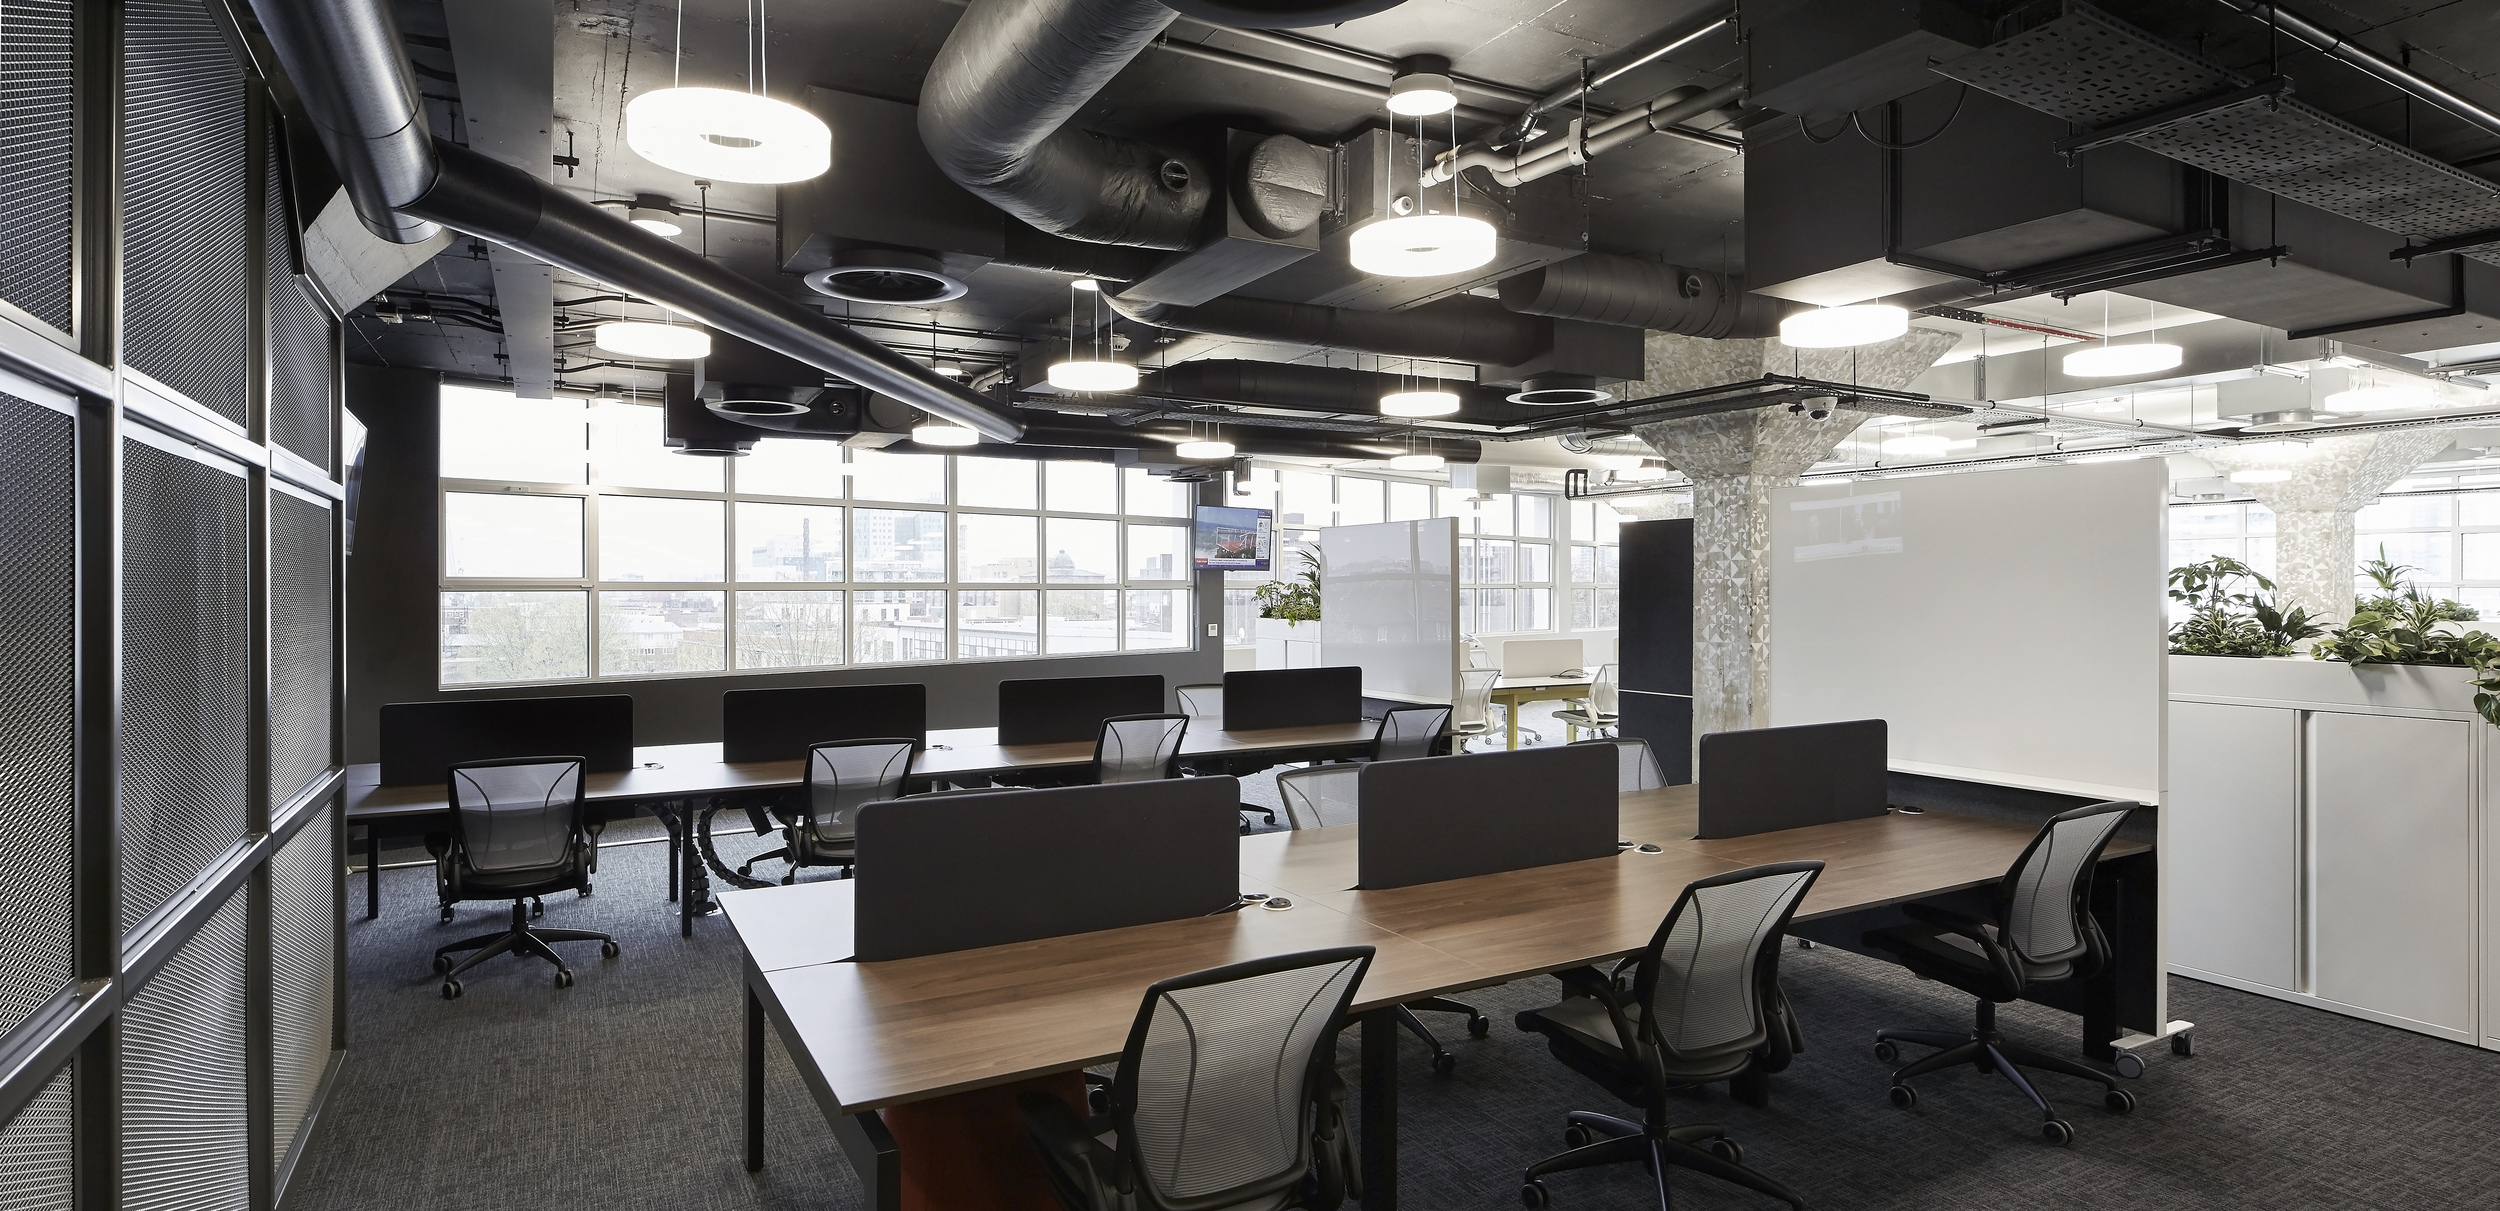 HLW_SKY offices_Brick Lane_-®Hufton+Crow_015.jpg